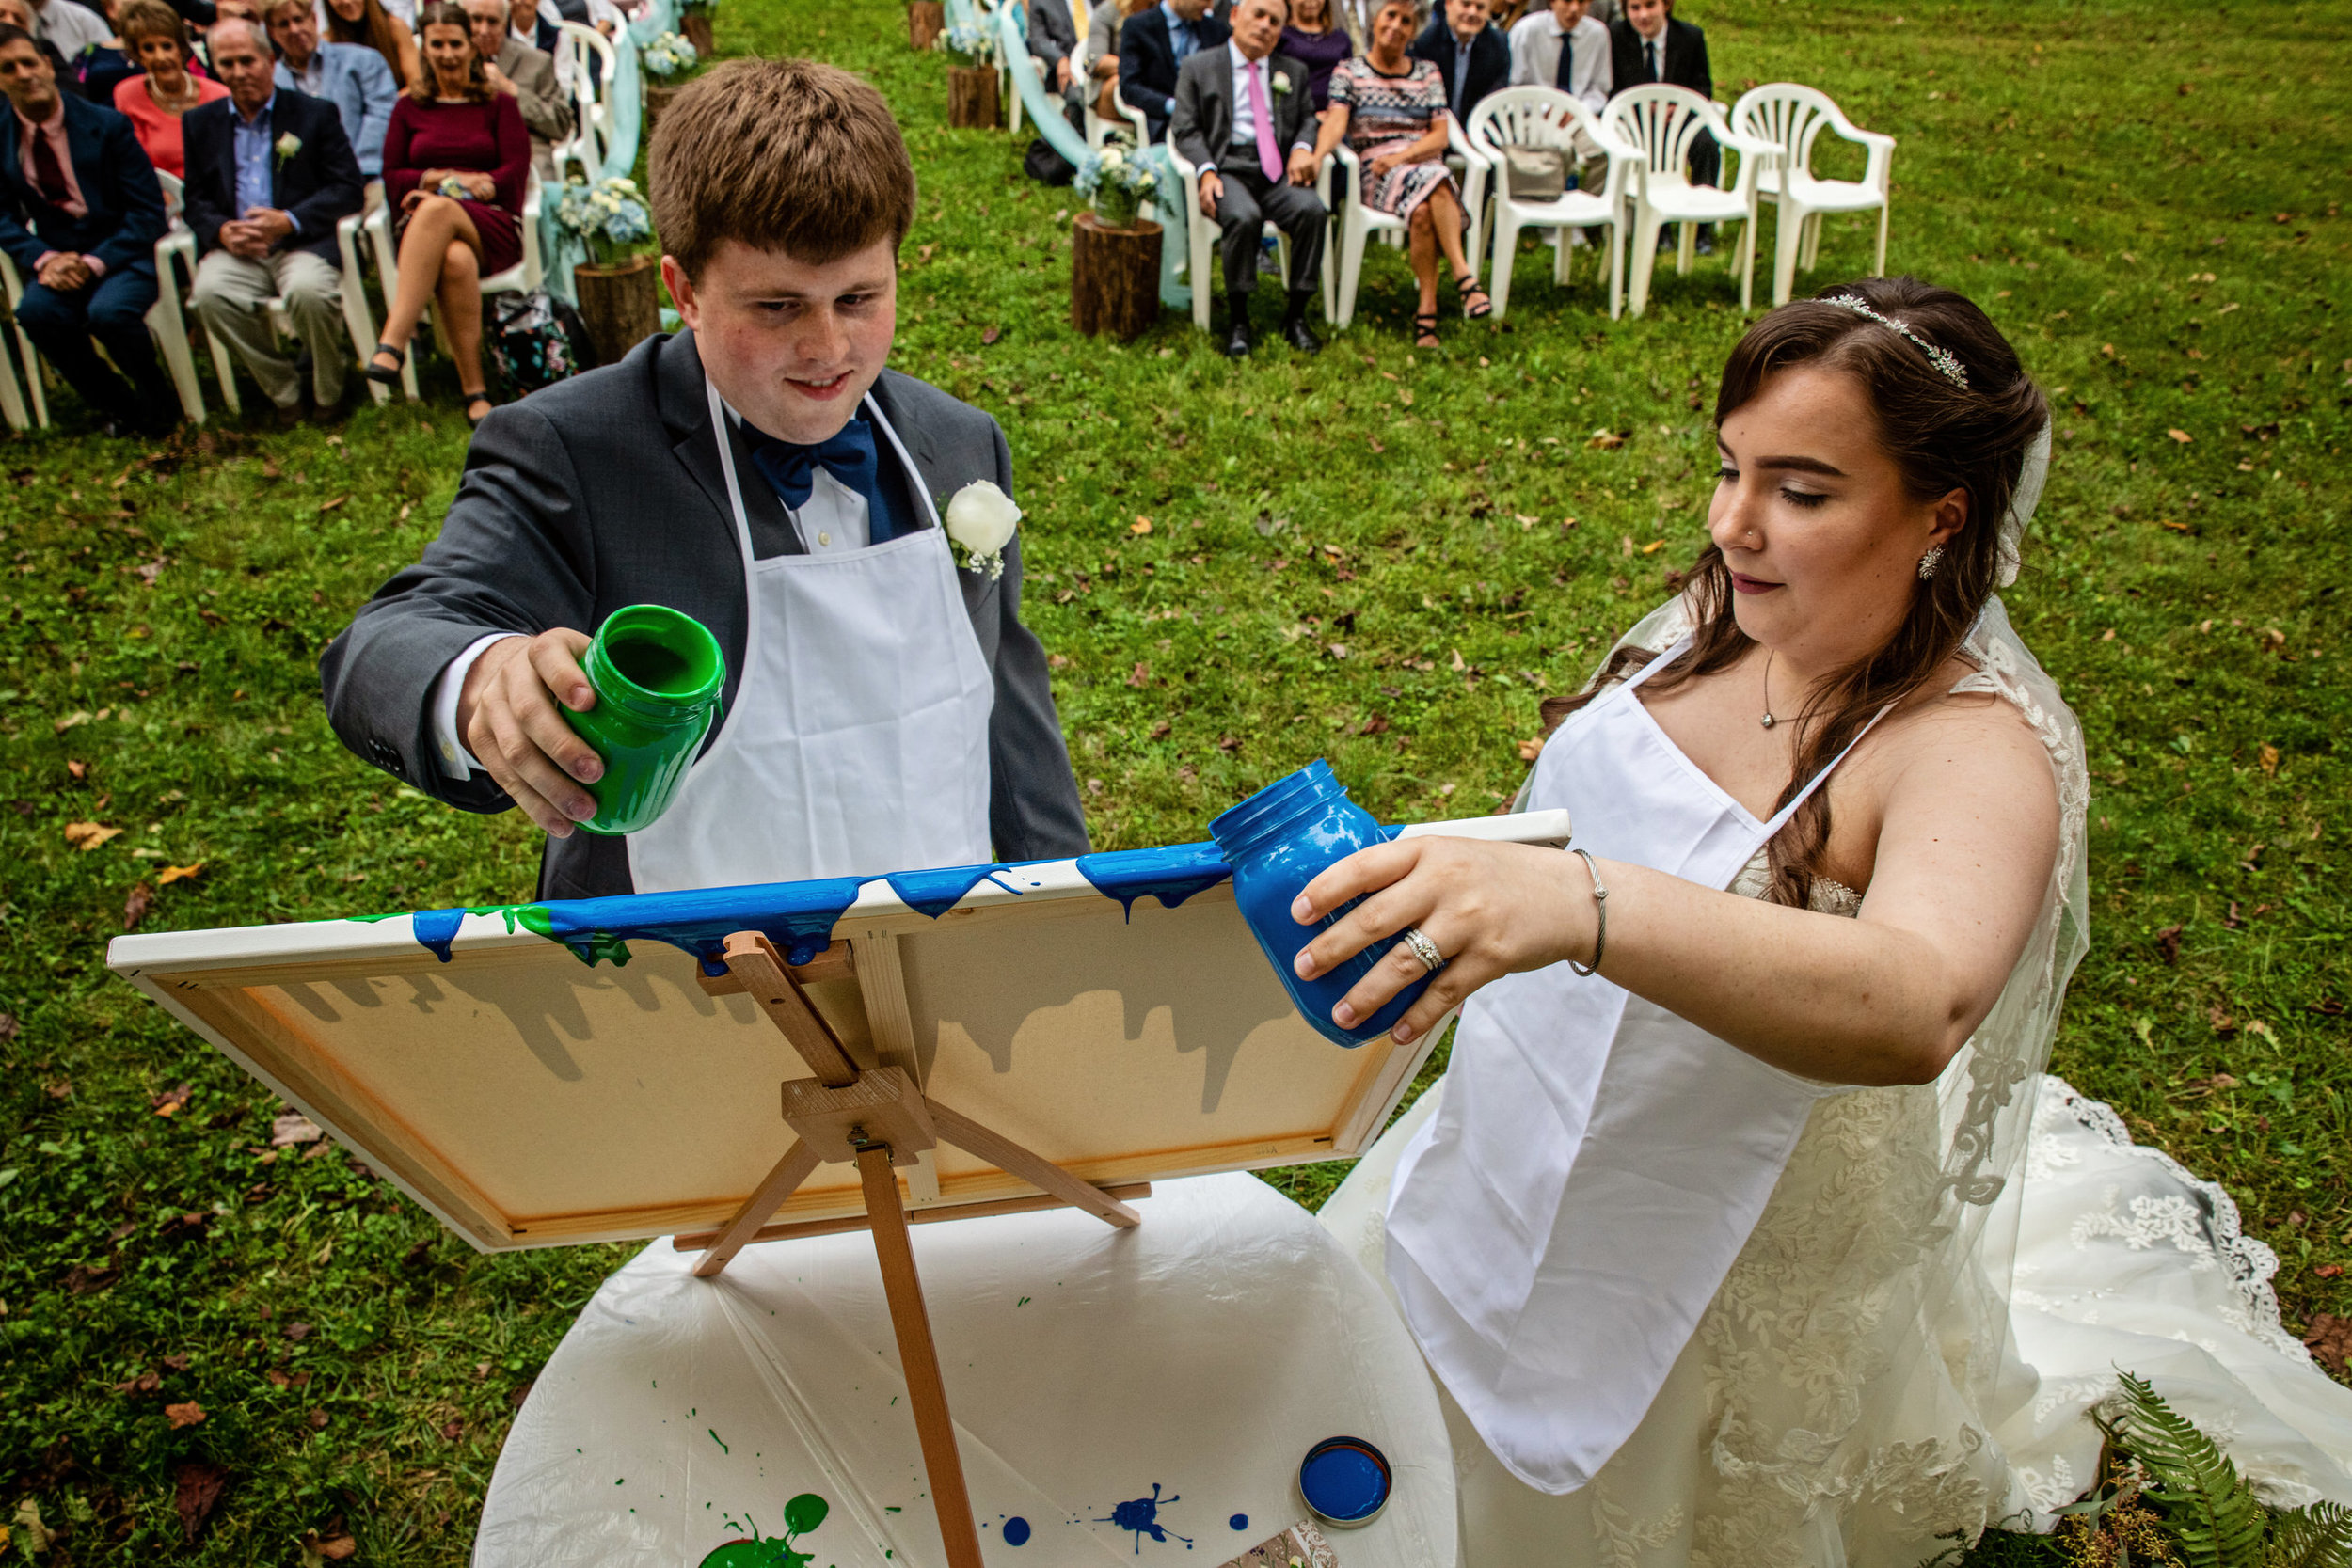 OstertaagVista-Caitlin&Brandon-Ceremony-9.jpg